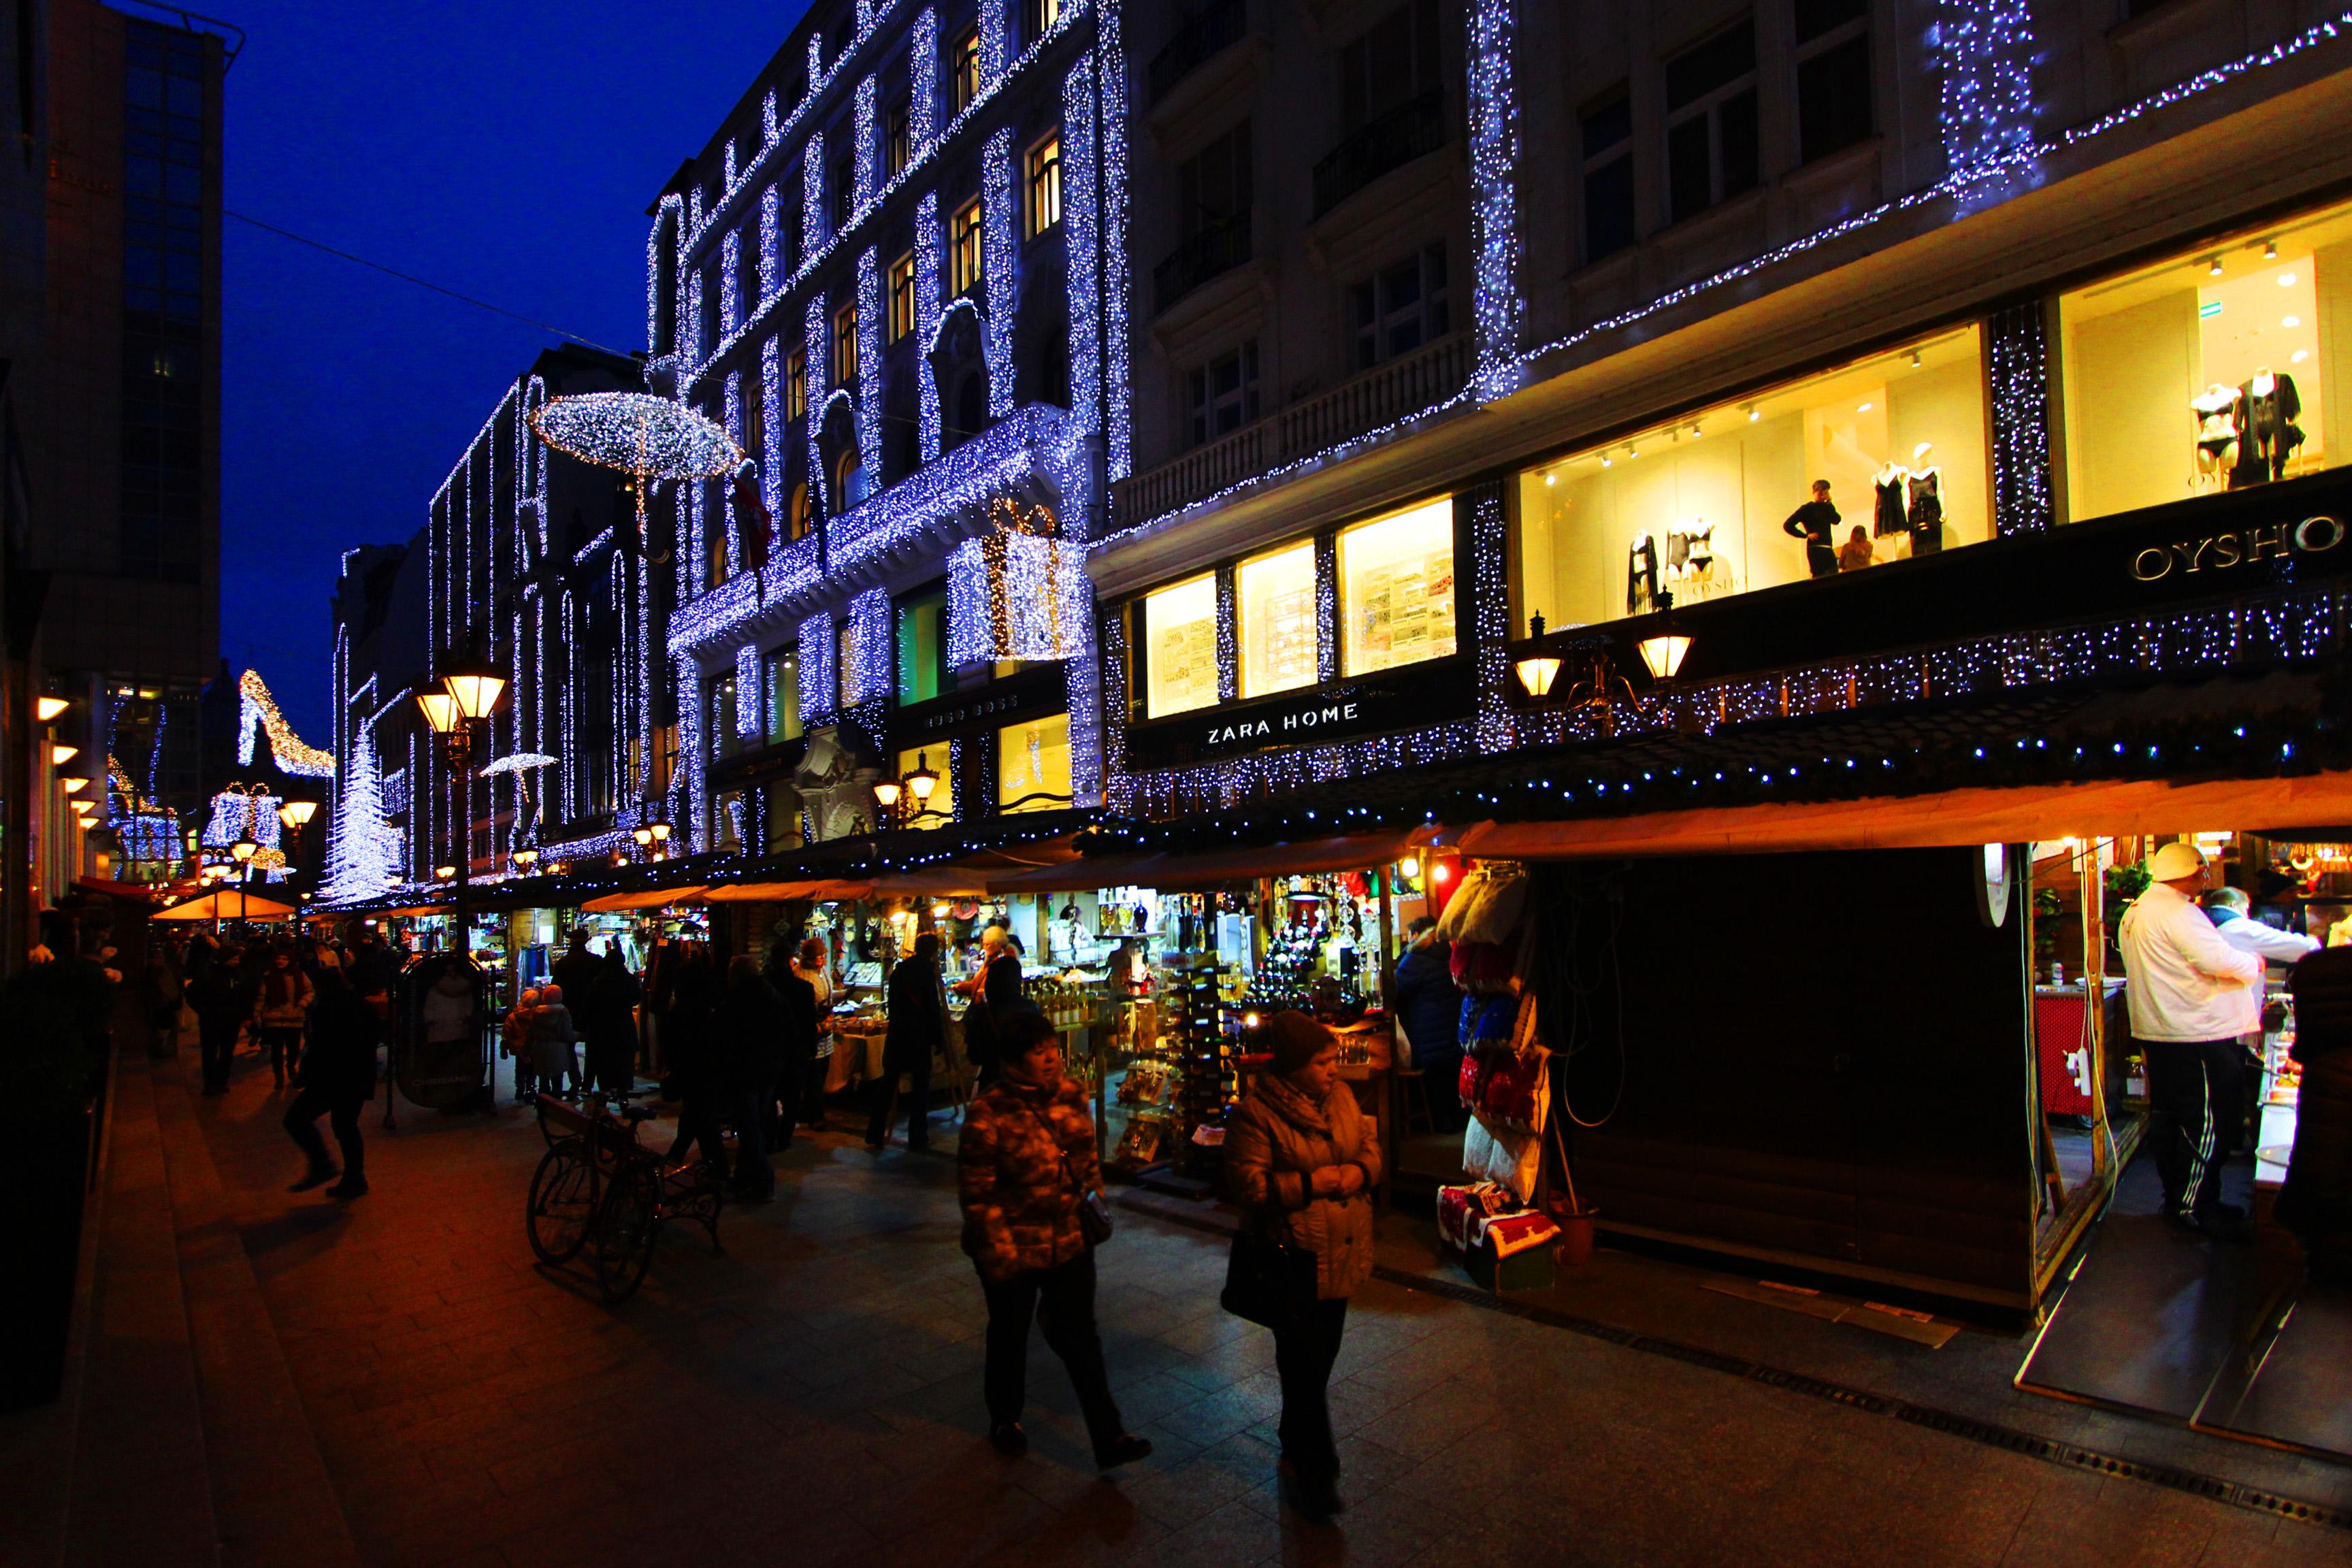 Vörösmarty téri karácsonyi vásár